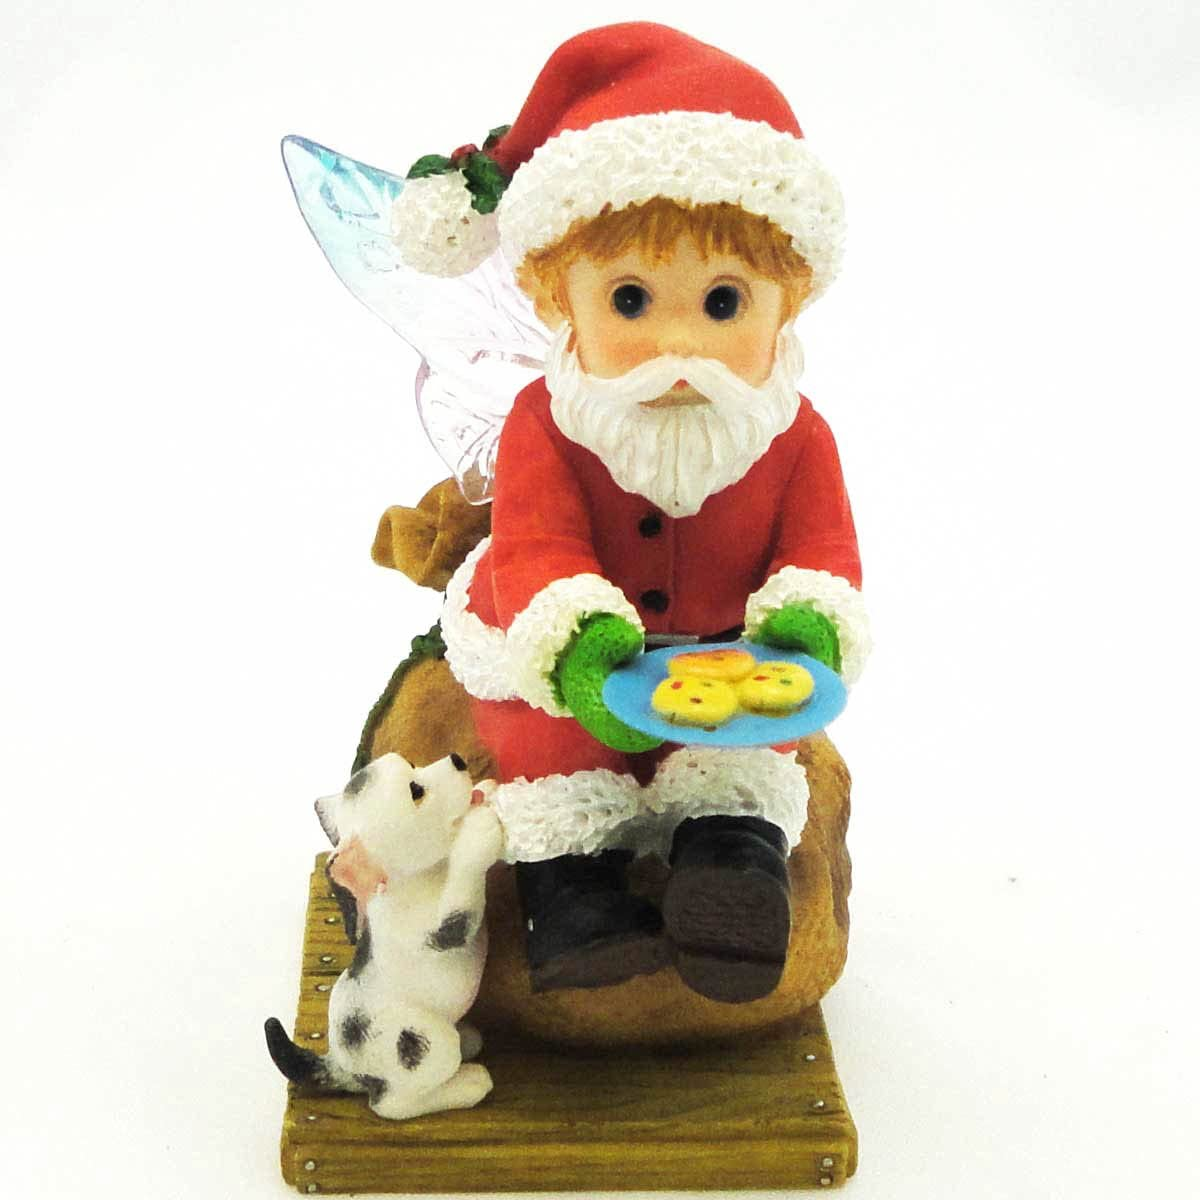 Enesco My Little Kitchen Fairies Santa Fairie Figurine, 3-3 4-Inch